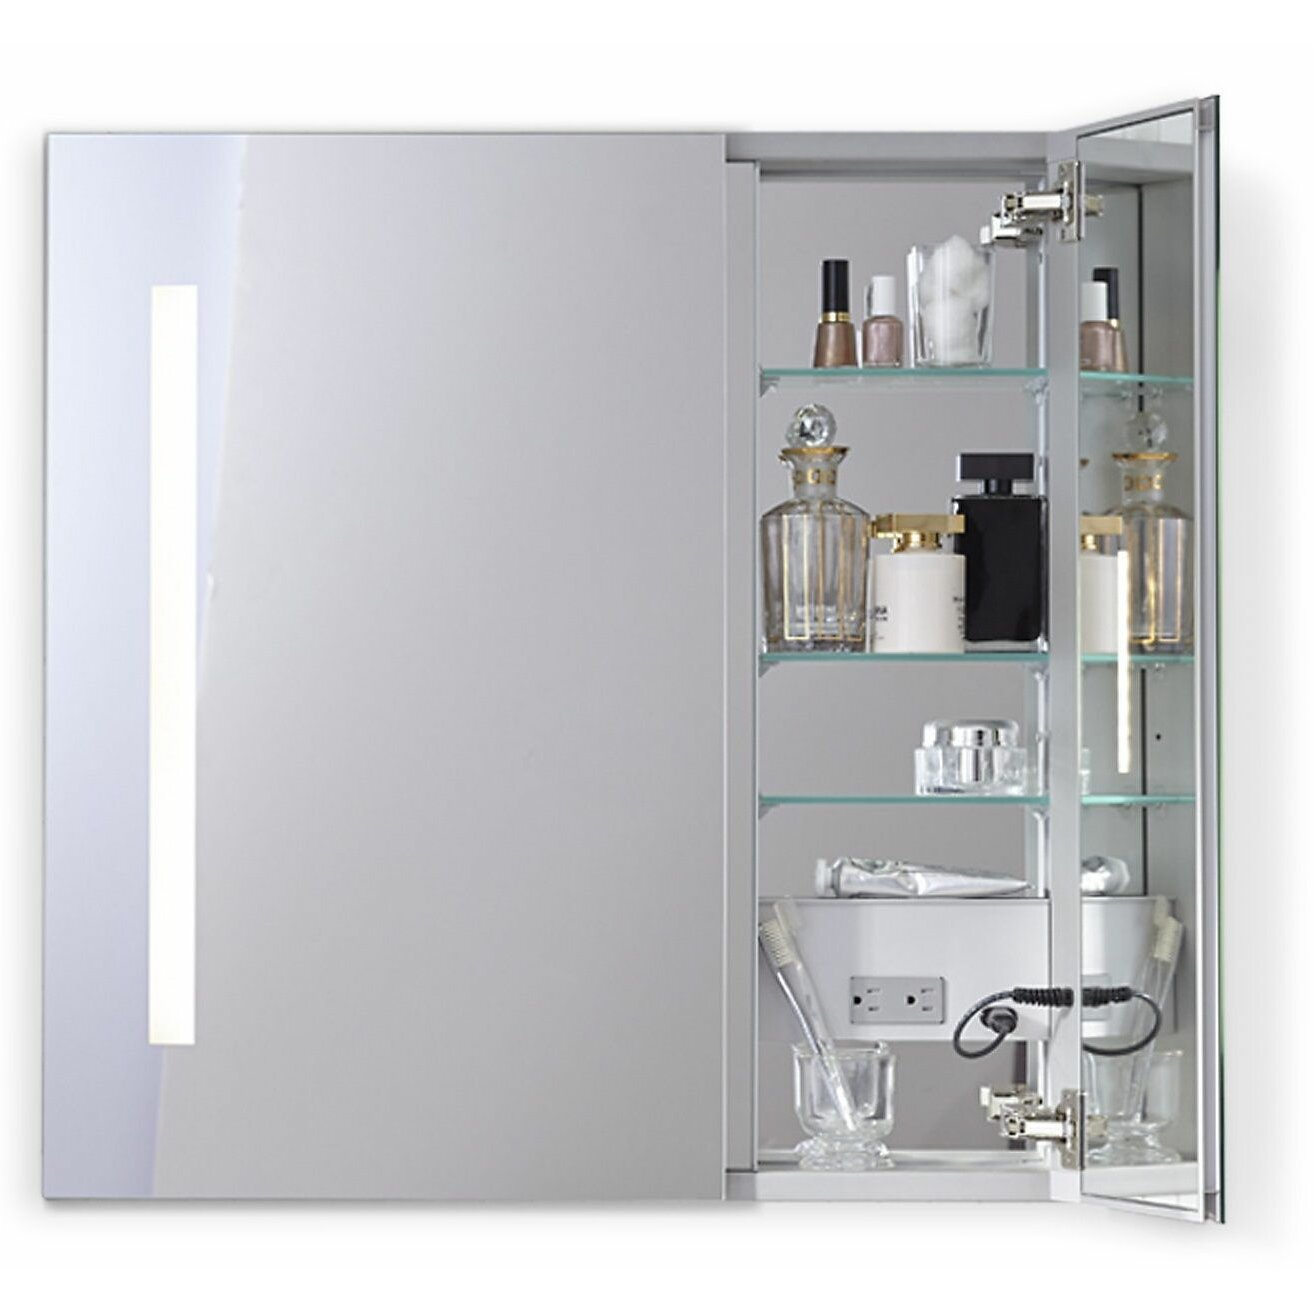 30 X 30 Medicine Cabinet Robern Aio 2925 X 30 Recessed Medicine Cabinet Wayfair